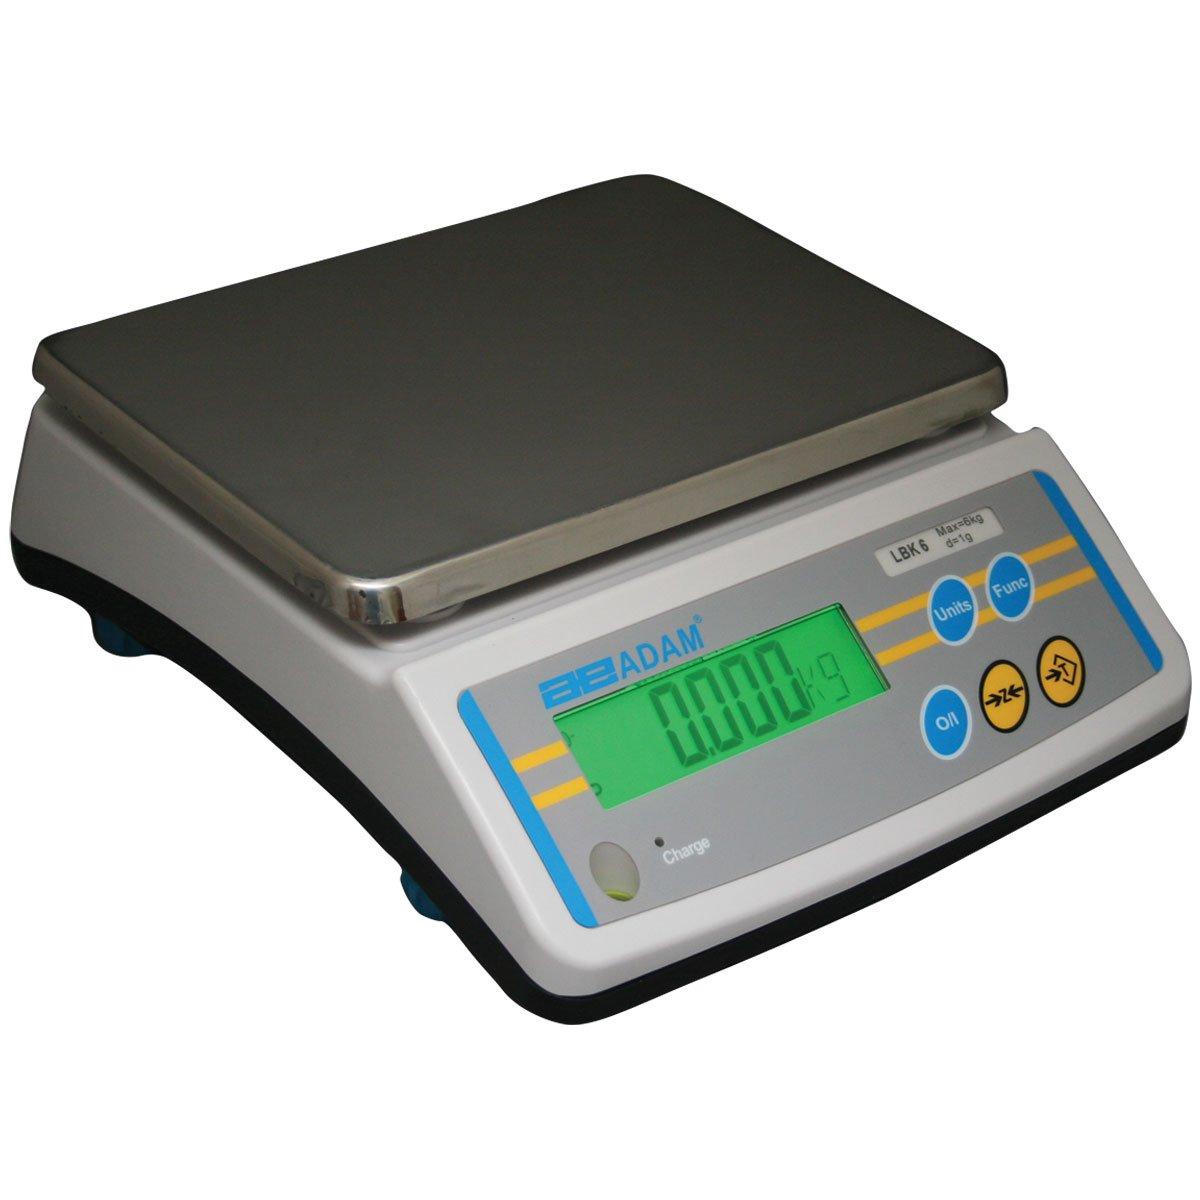 Adam Equipment LBK 6a Compact Bench Scale, 6lb/3000g Capacity, 0.001lb/0.5g Readability